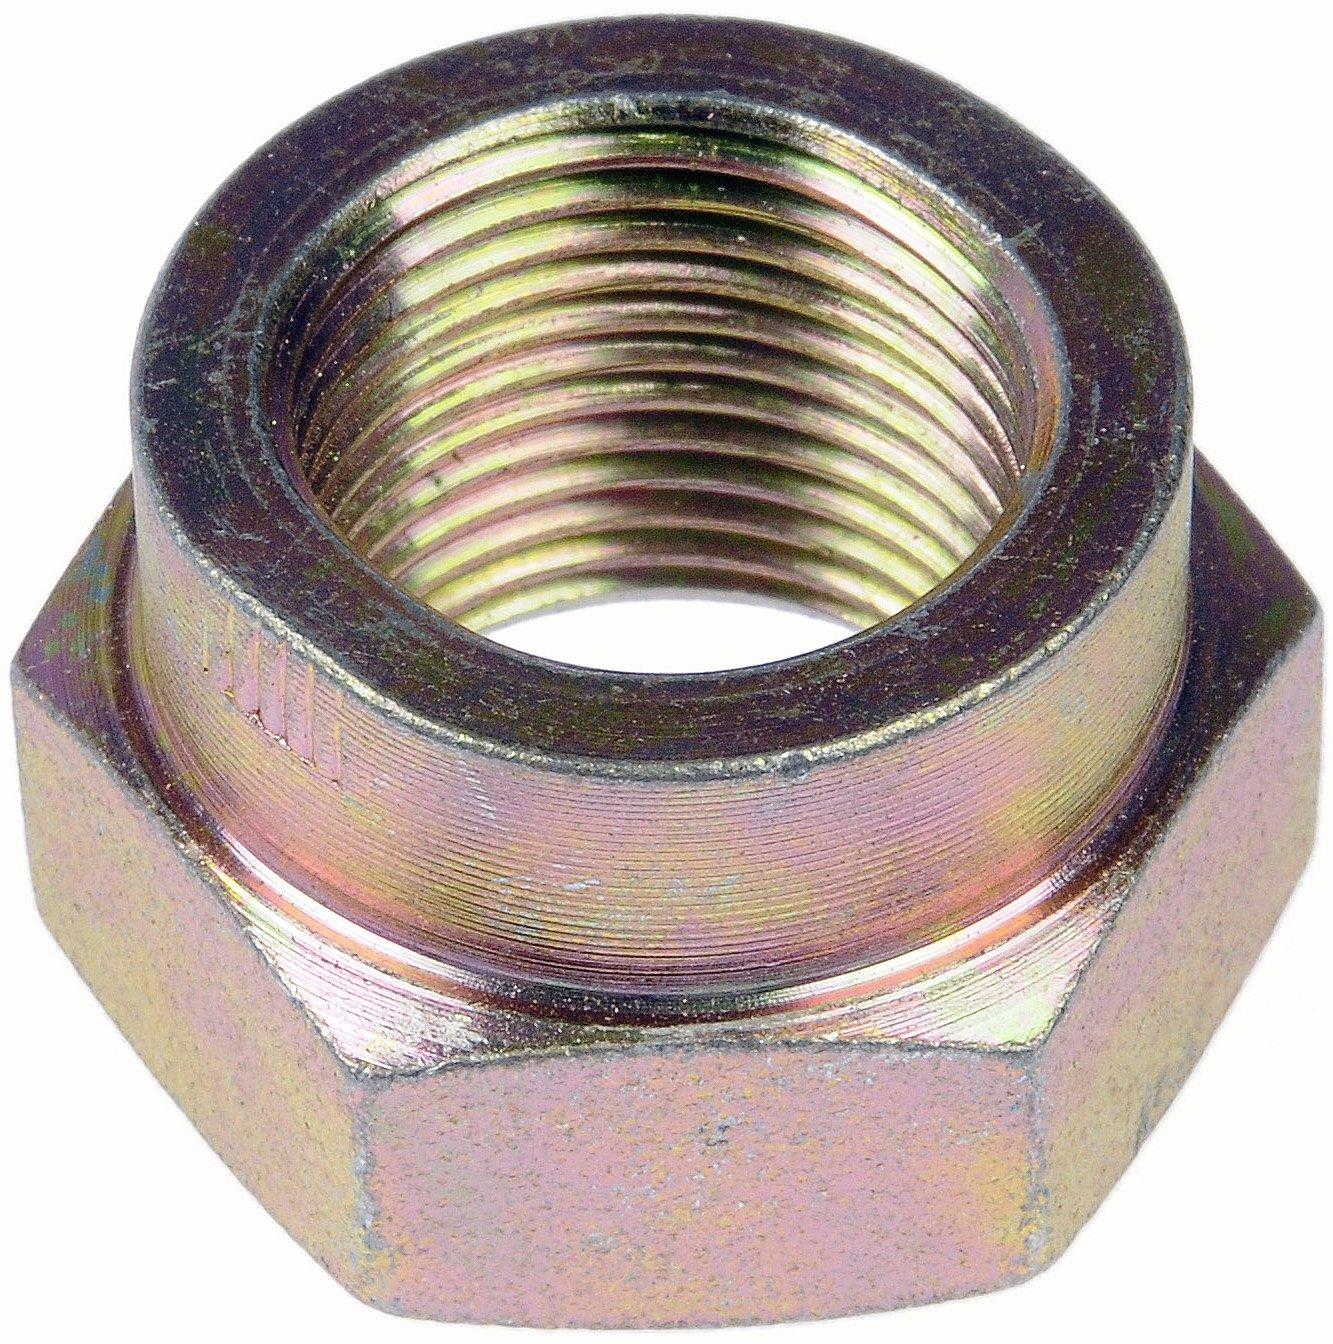 Dorman 05170 Spindle Lock Nut Kit Dorman - Autograde